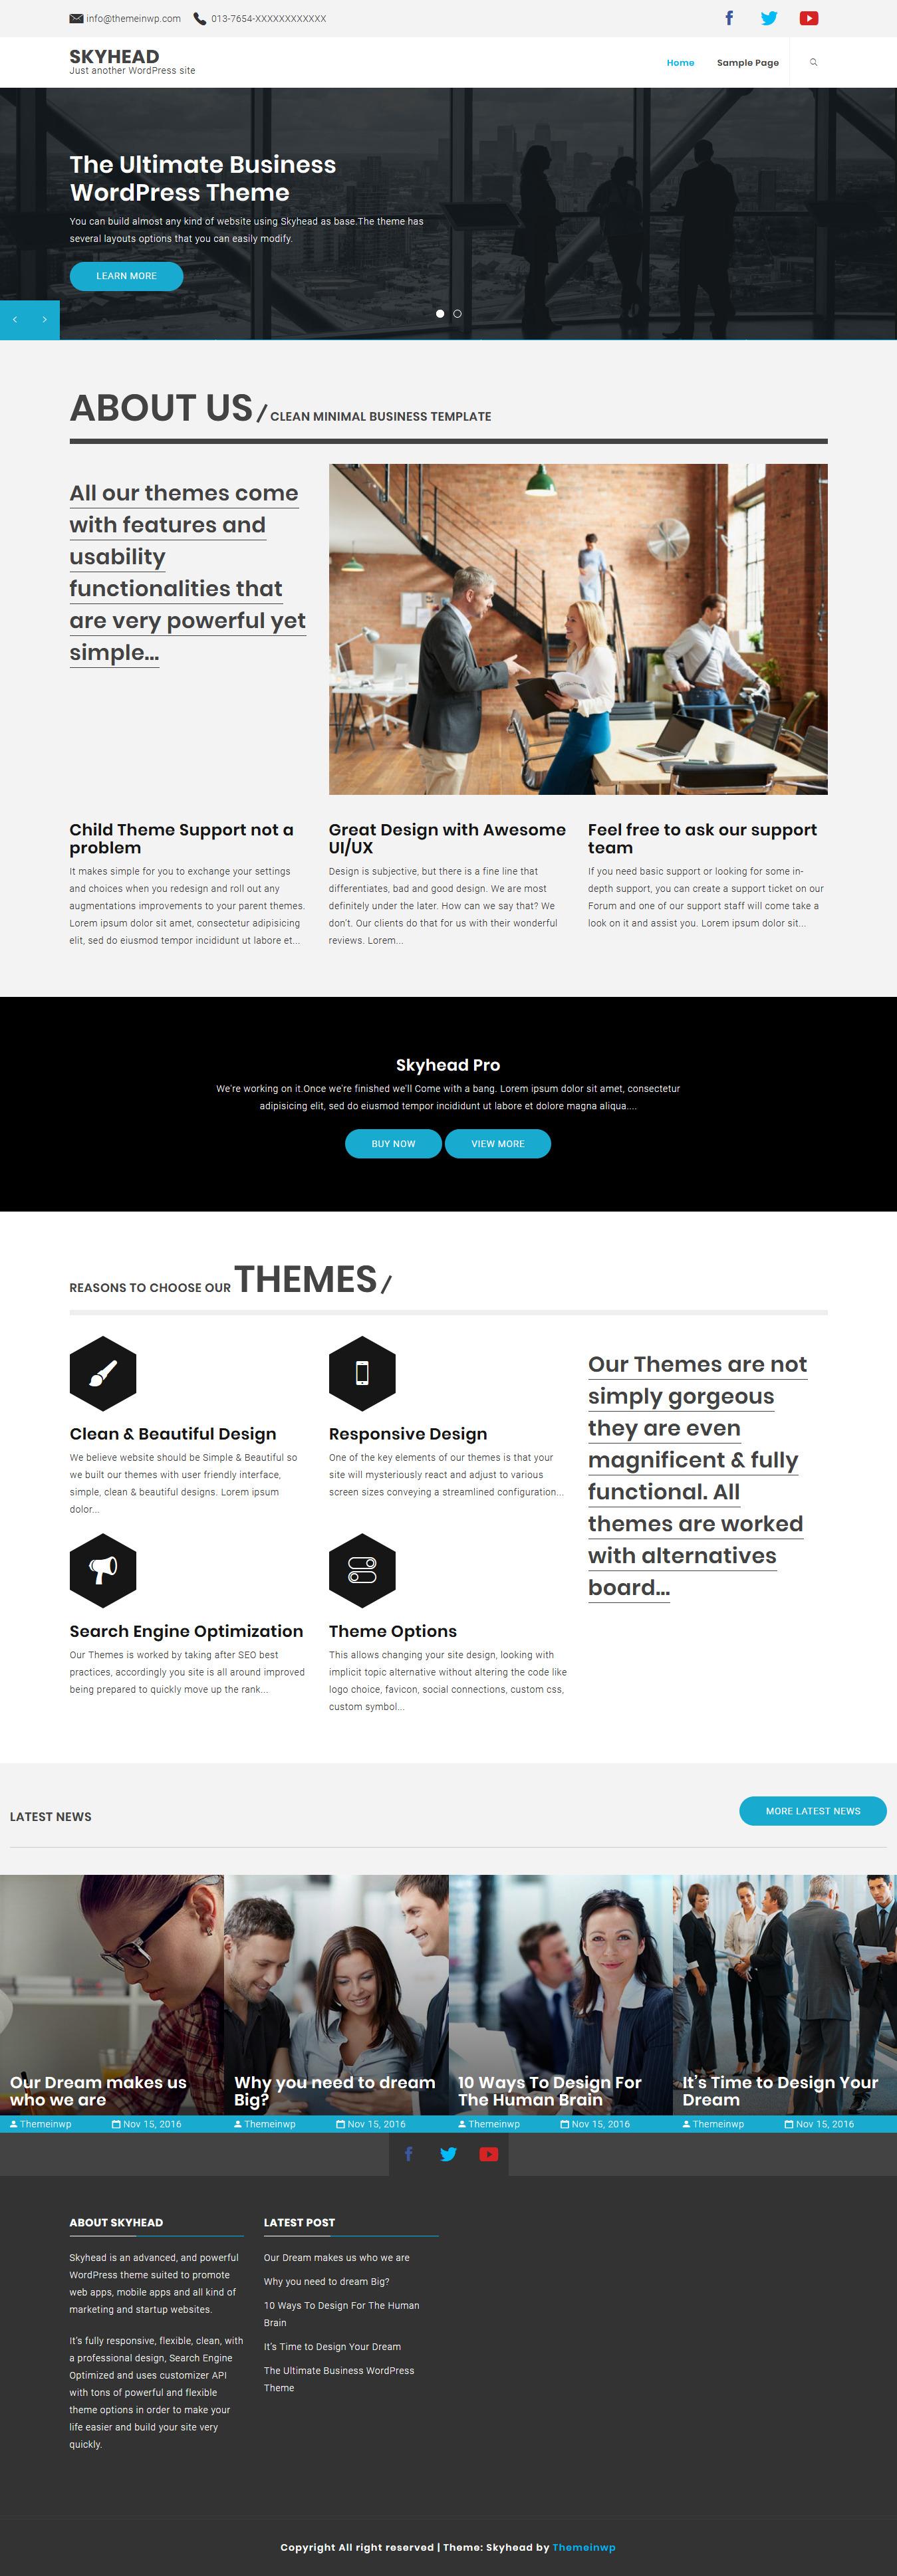 skyhead best free mobile app wordpress theme - 10+ Best Free Mobile App WordPress Themes